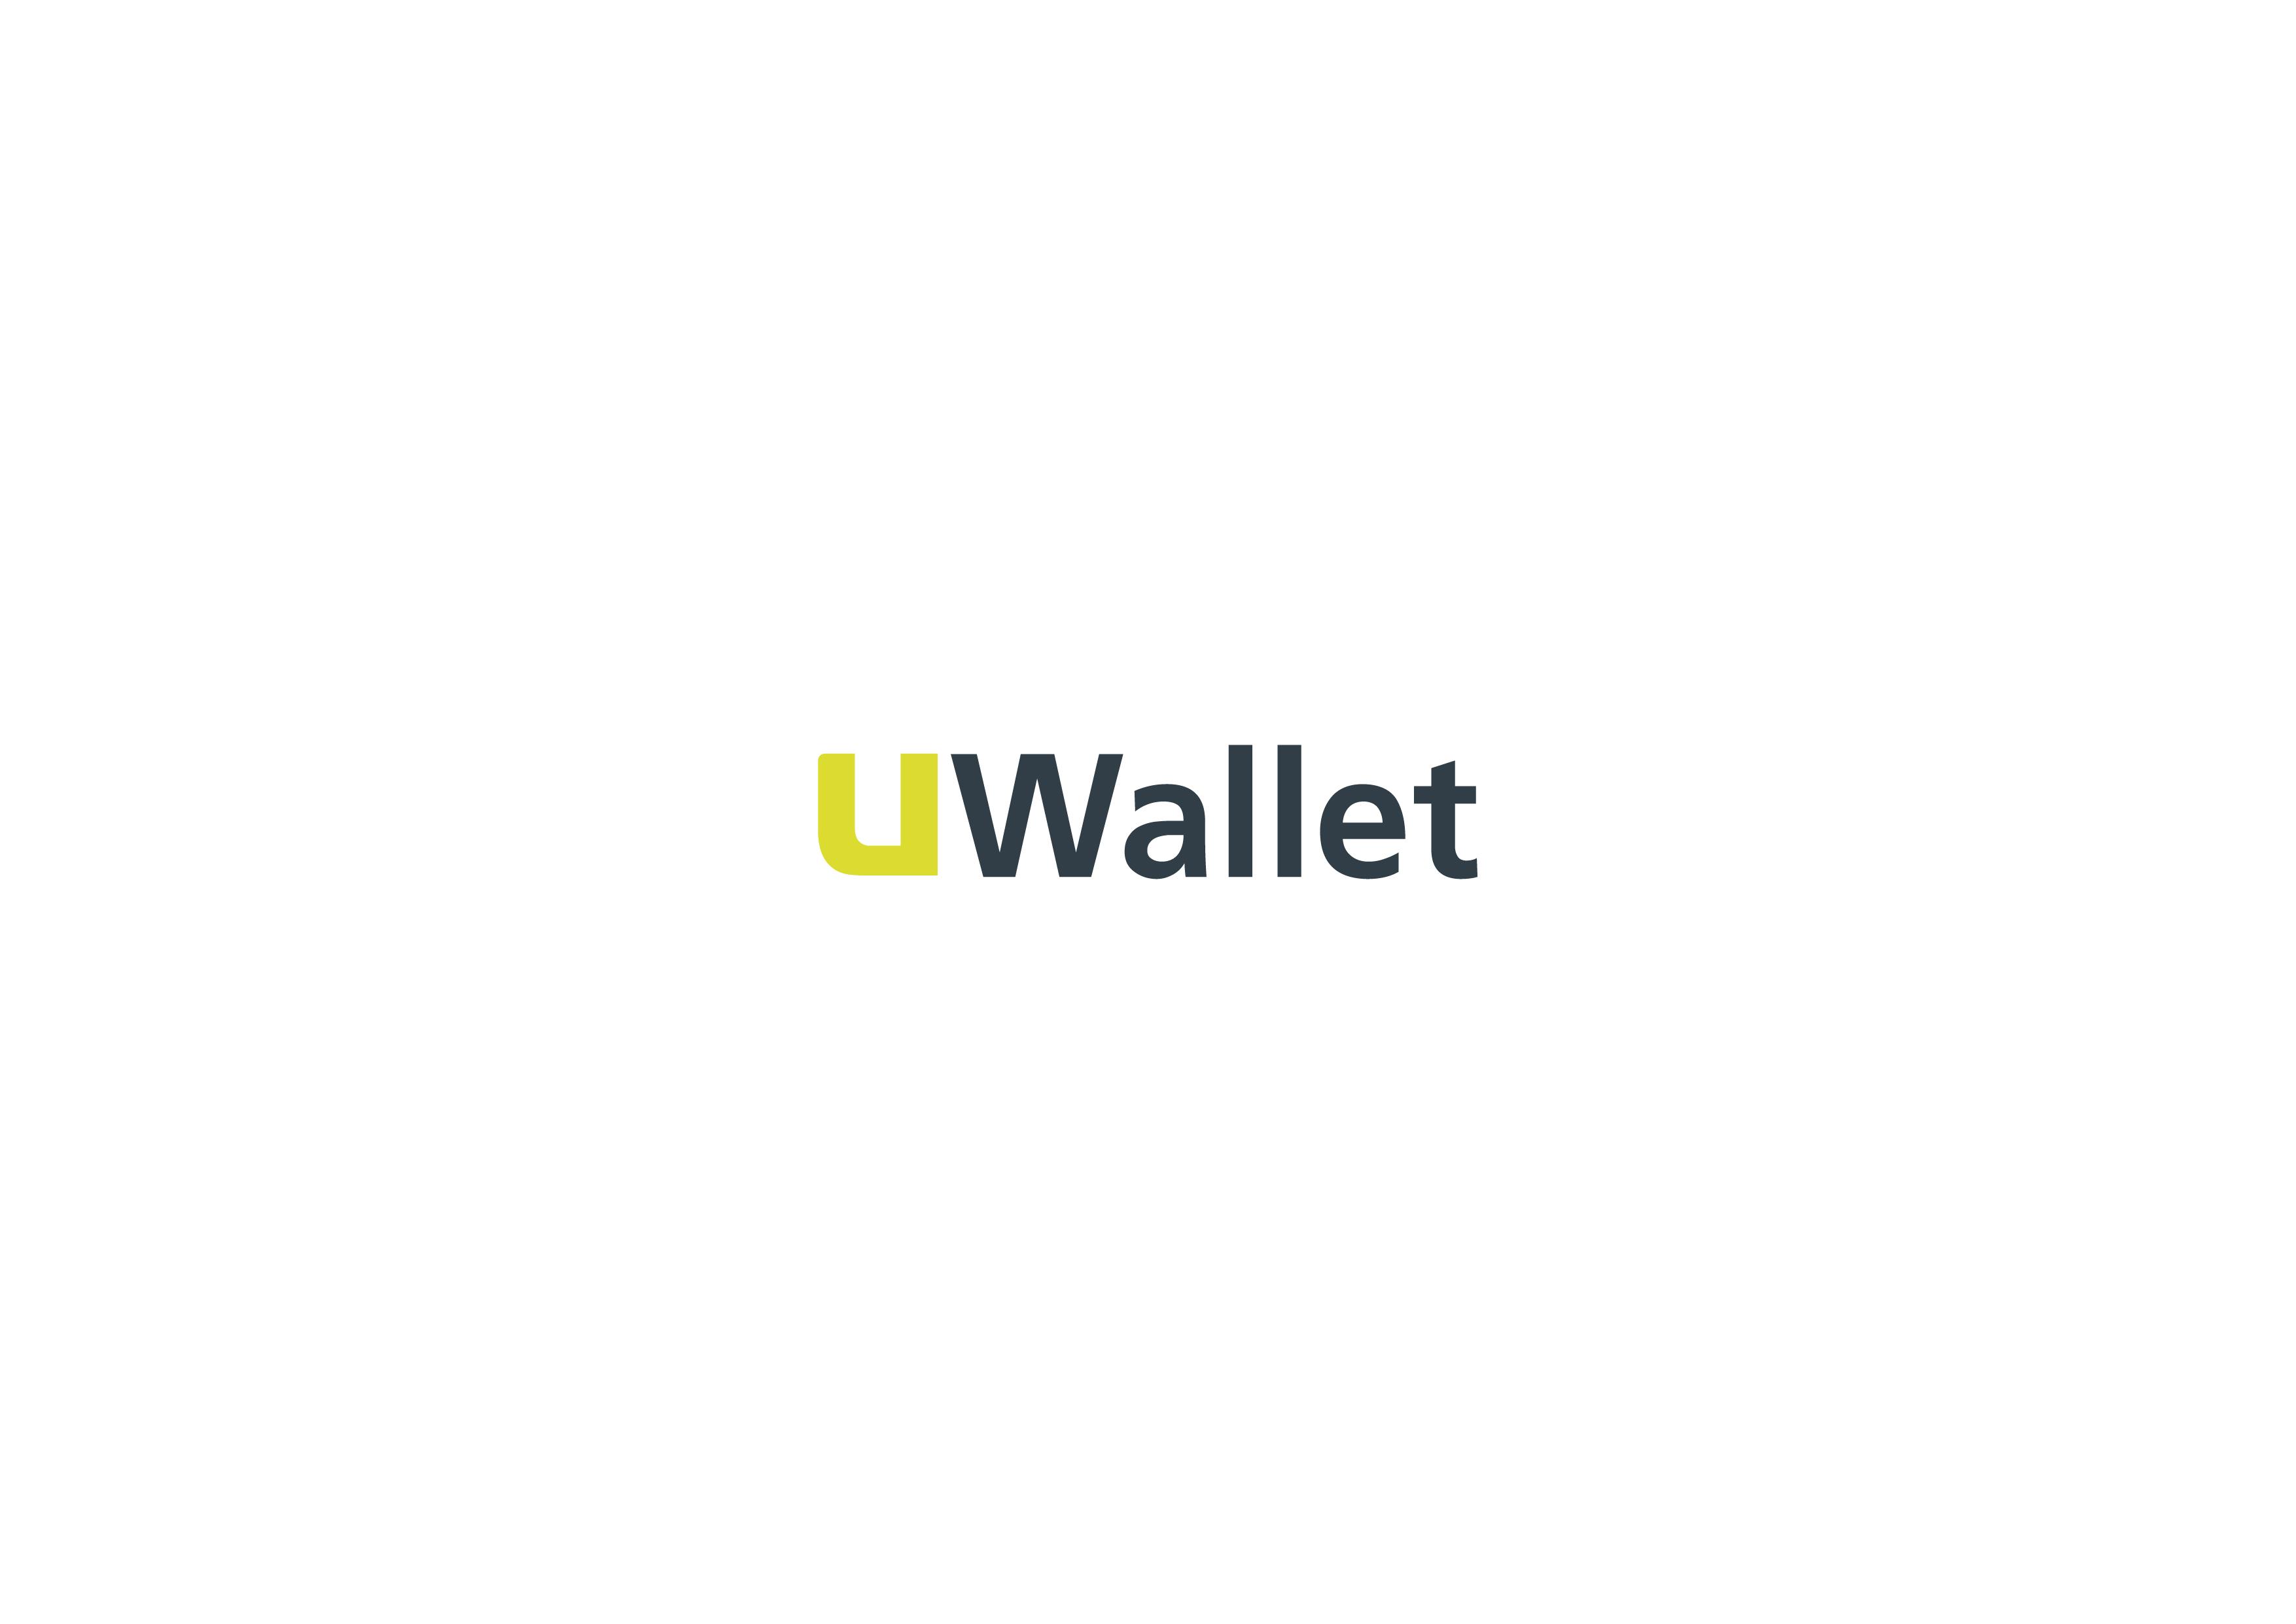 UWallet تضيف خدمة القسائم الإلكترونية على تطبيقها لإثراء تجارب عملائها